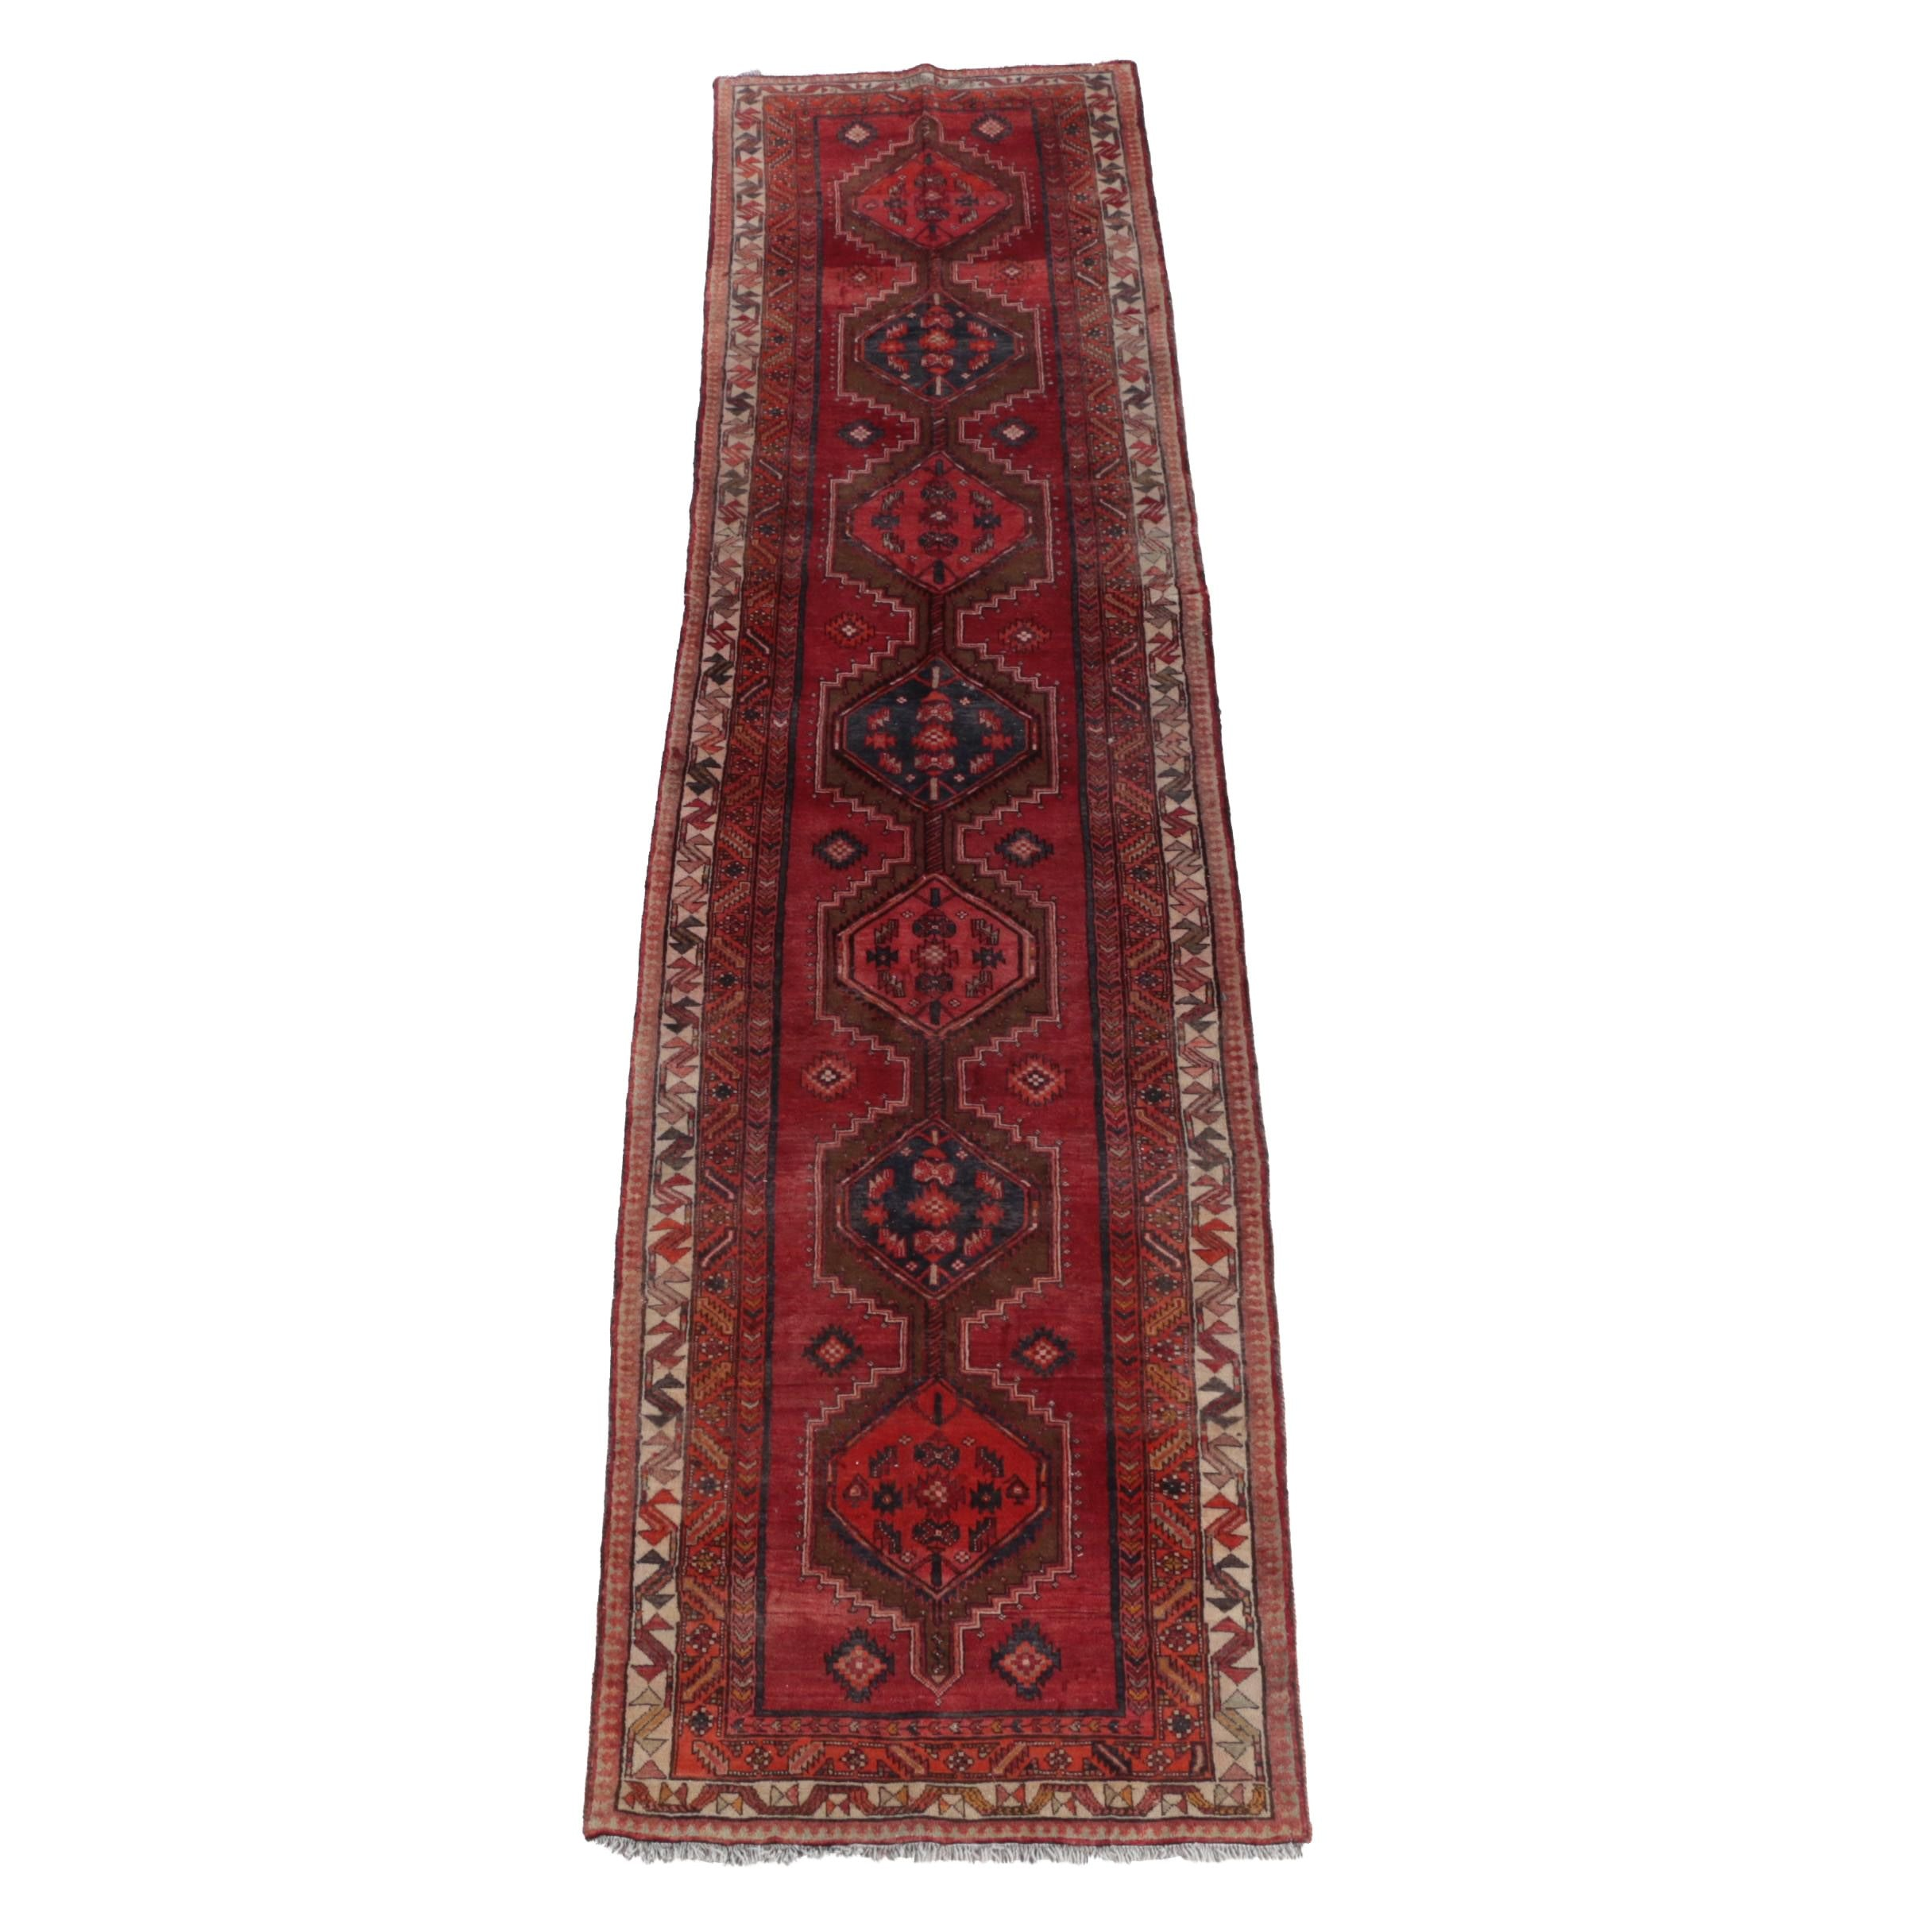 Hand-Knotted Caucasian Wool Carpet Runner